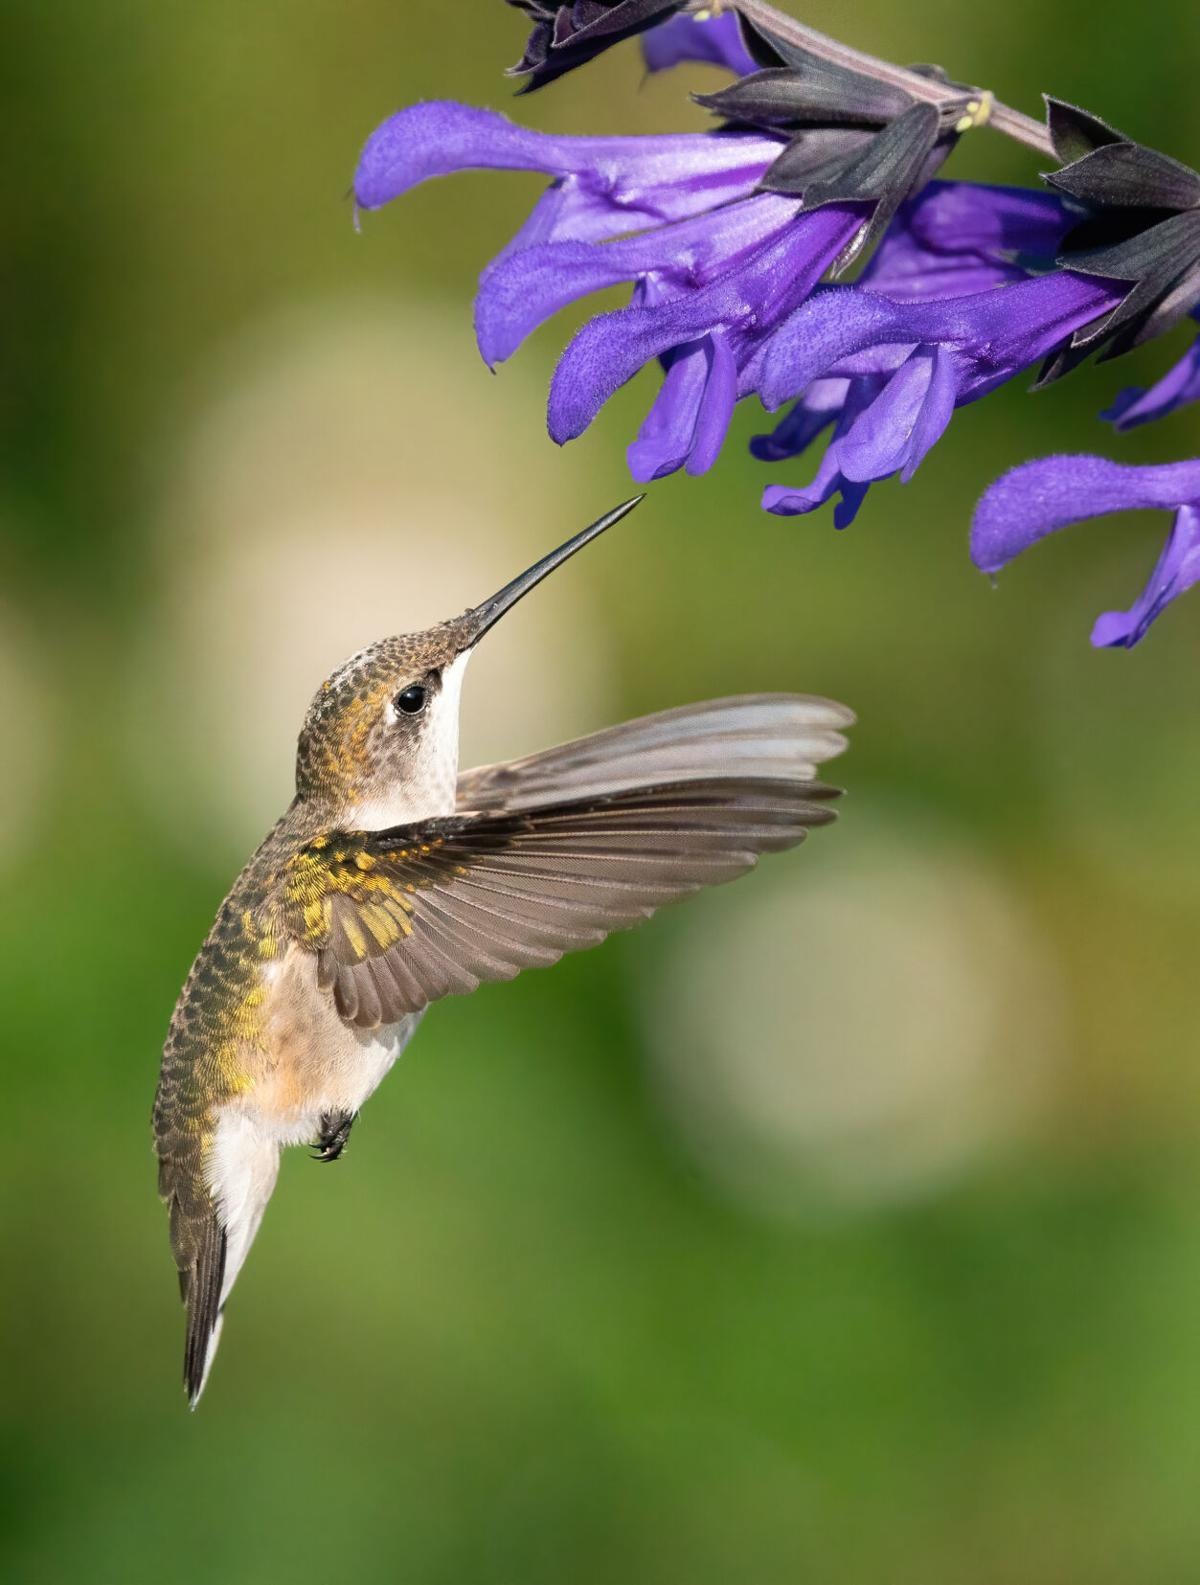 Hummingbirds dazzle backyard birders